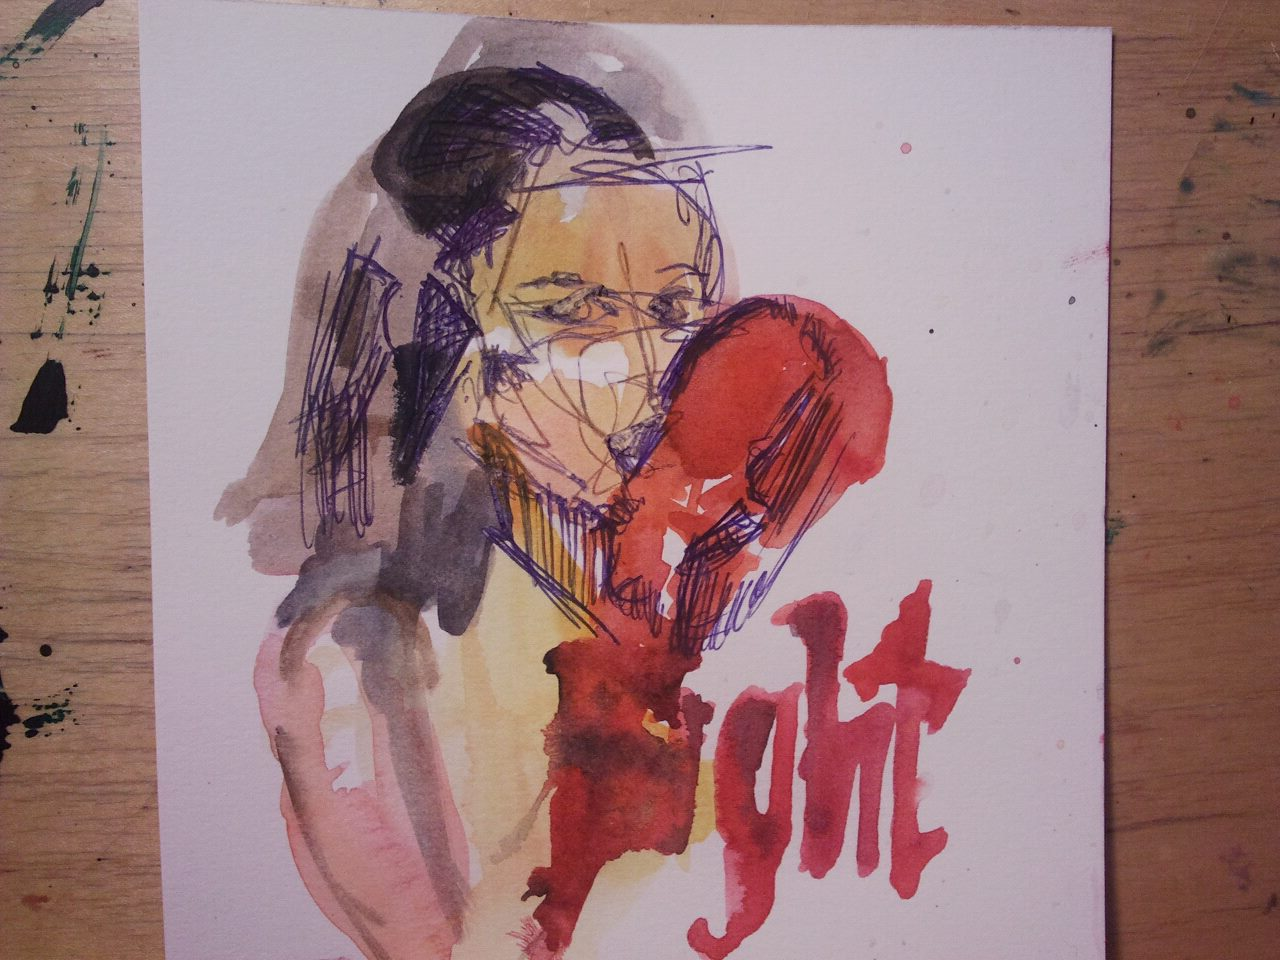 http://3.bp.blogspot.com/-xFFMf-i8Py4/TmARicjBPgI/AAAAAAAAAoU/5WnmBnXS4lk/s1600/fightforyourlife.jpg